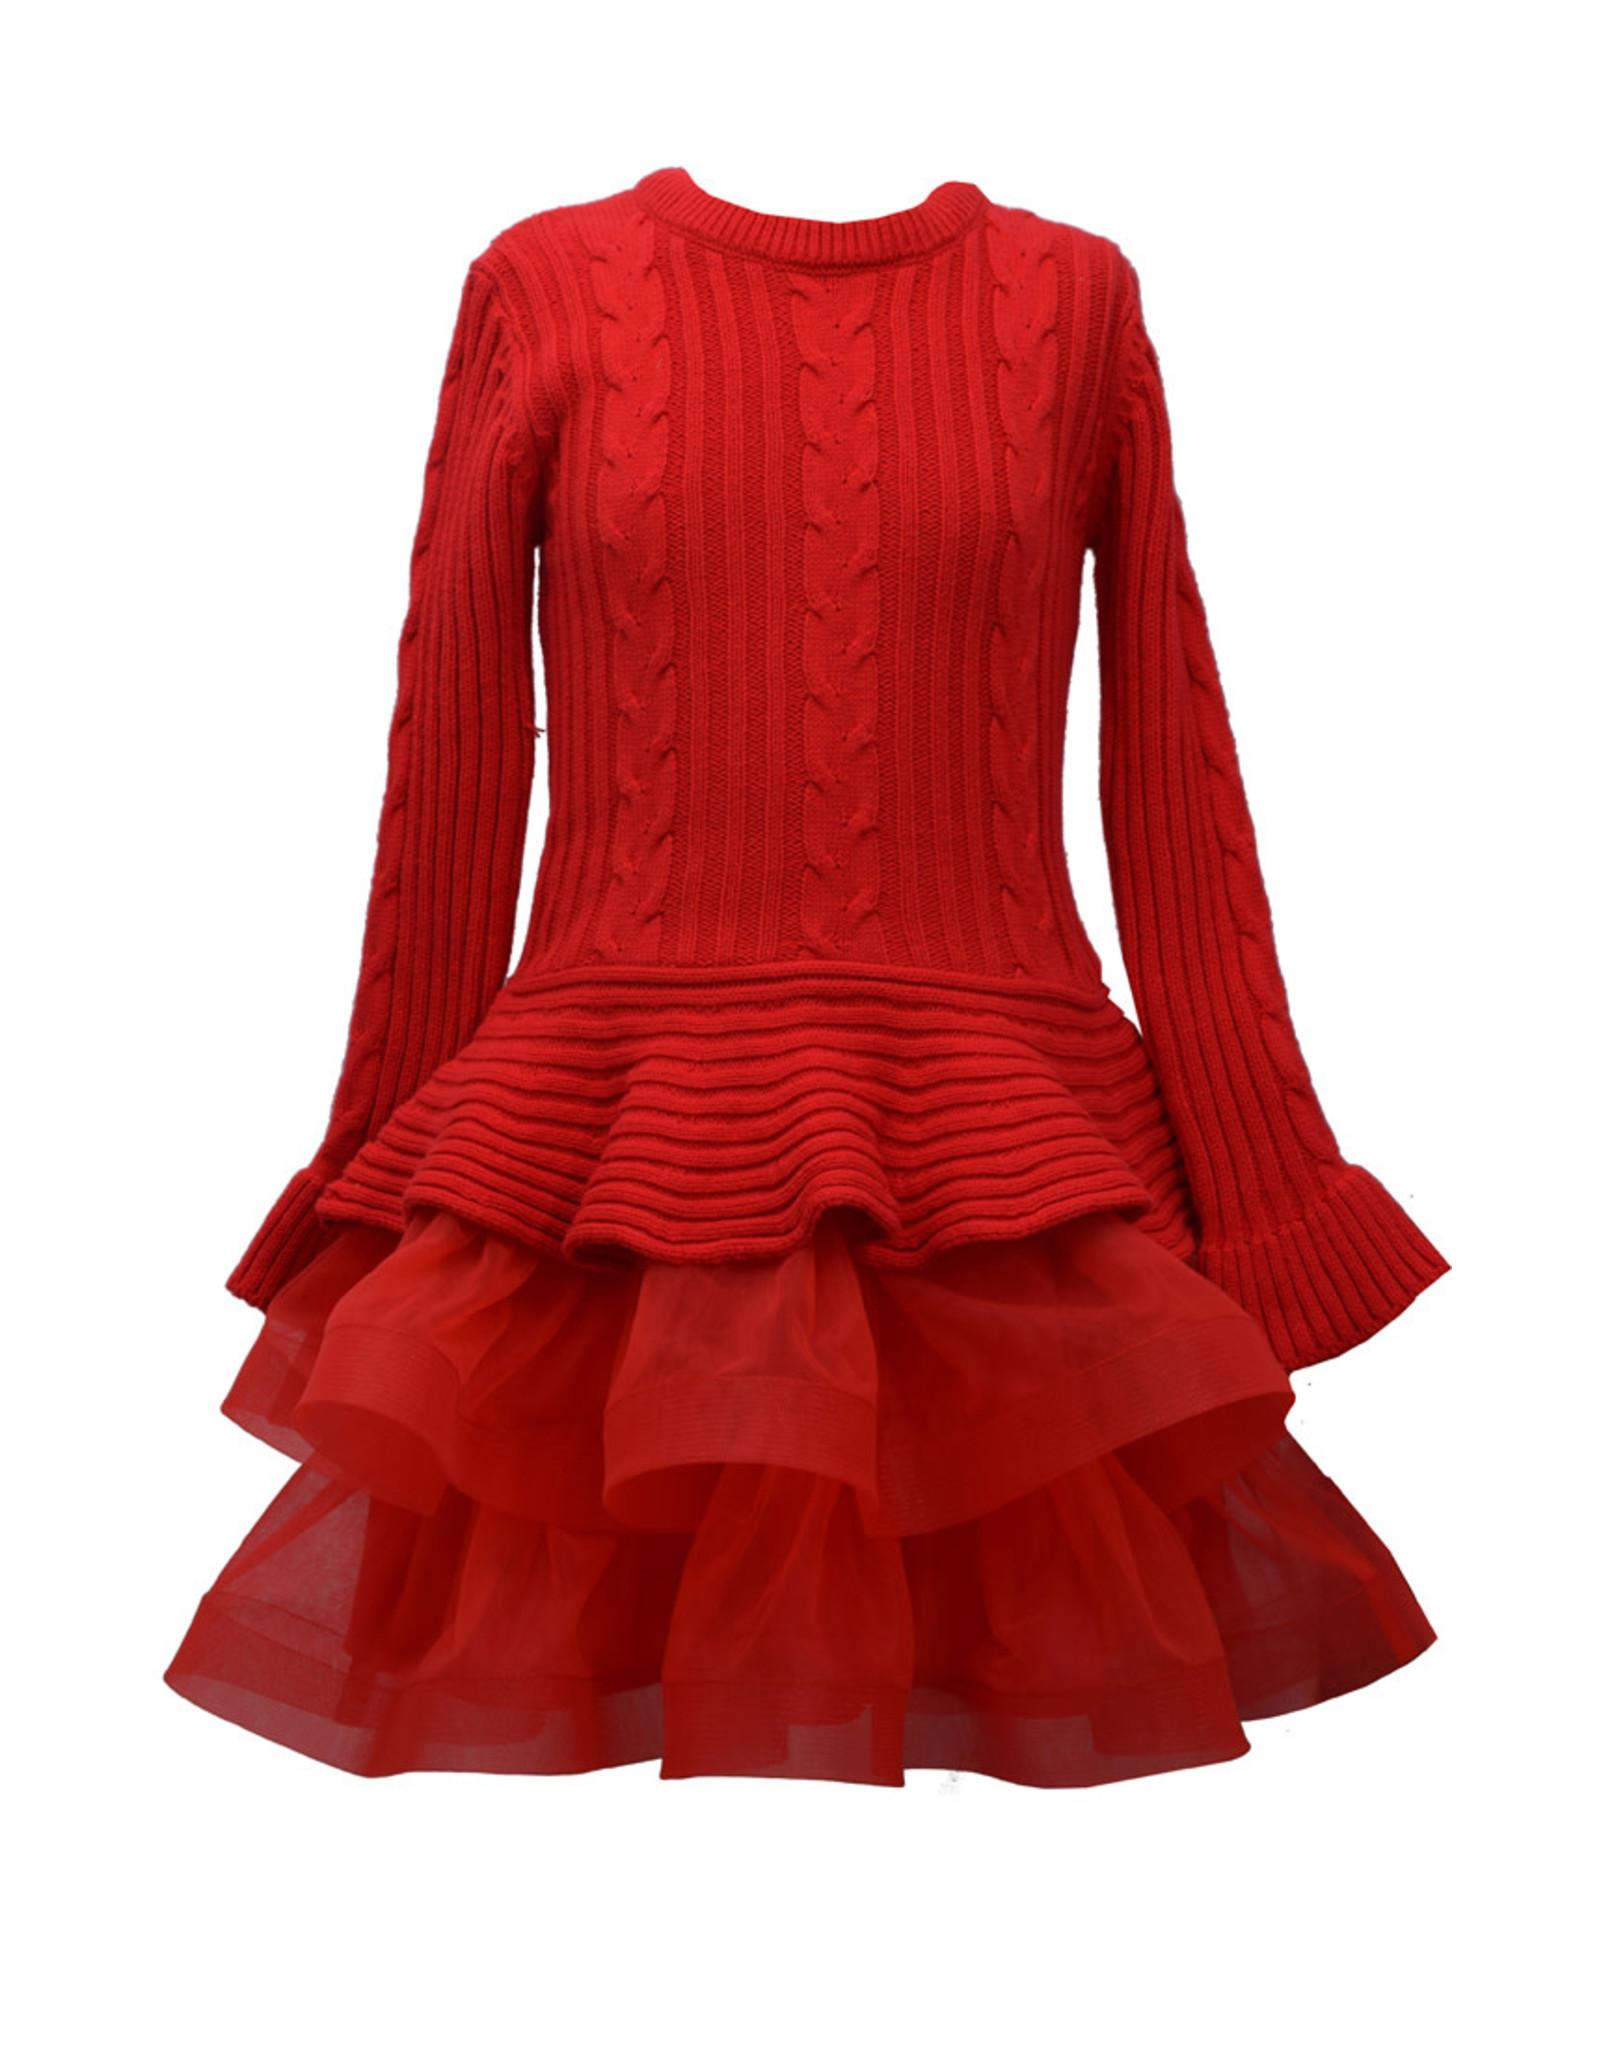 Bonnie  Jean Bonnie Jean- Red Cable Knit Skirt Sweater Dress